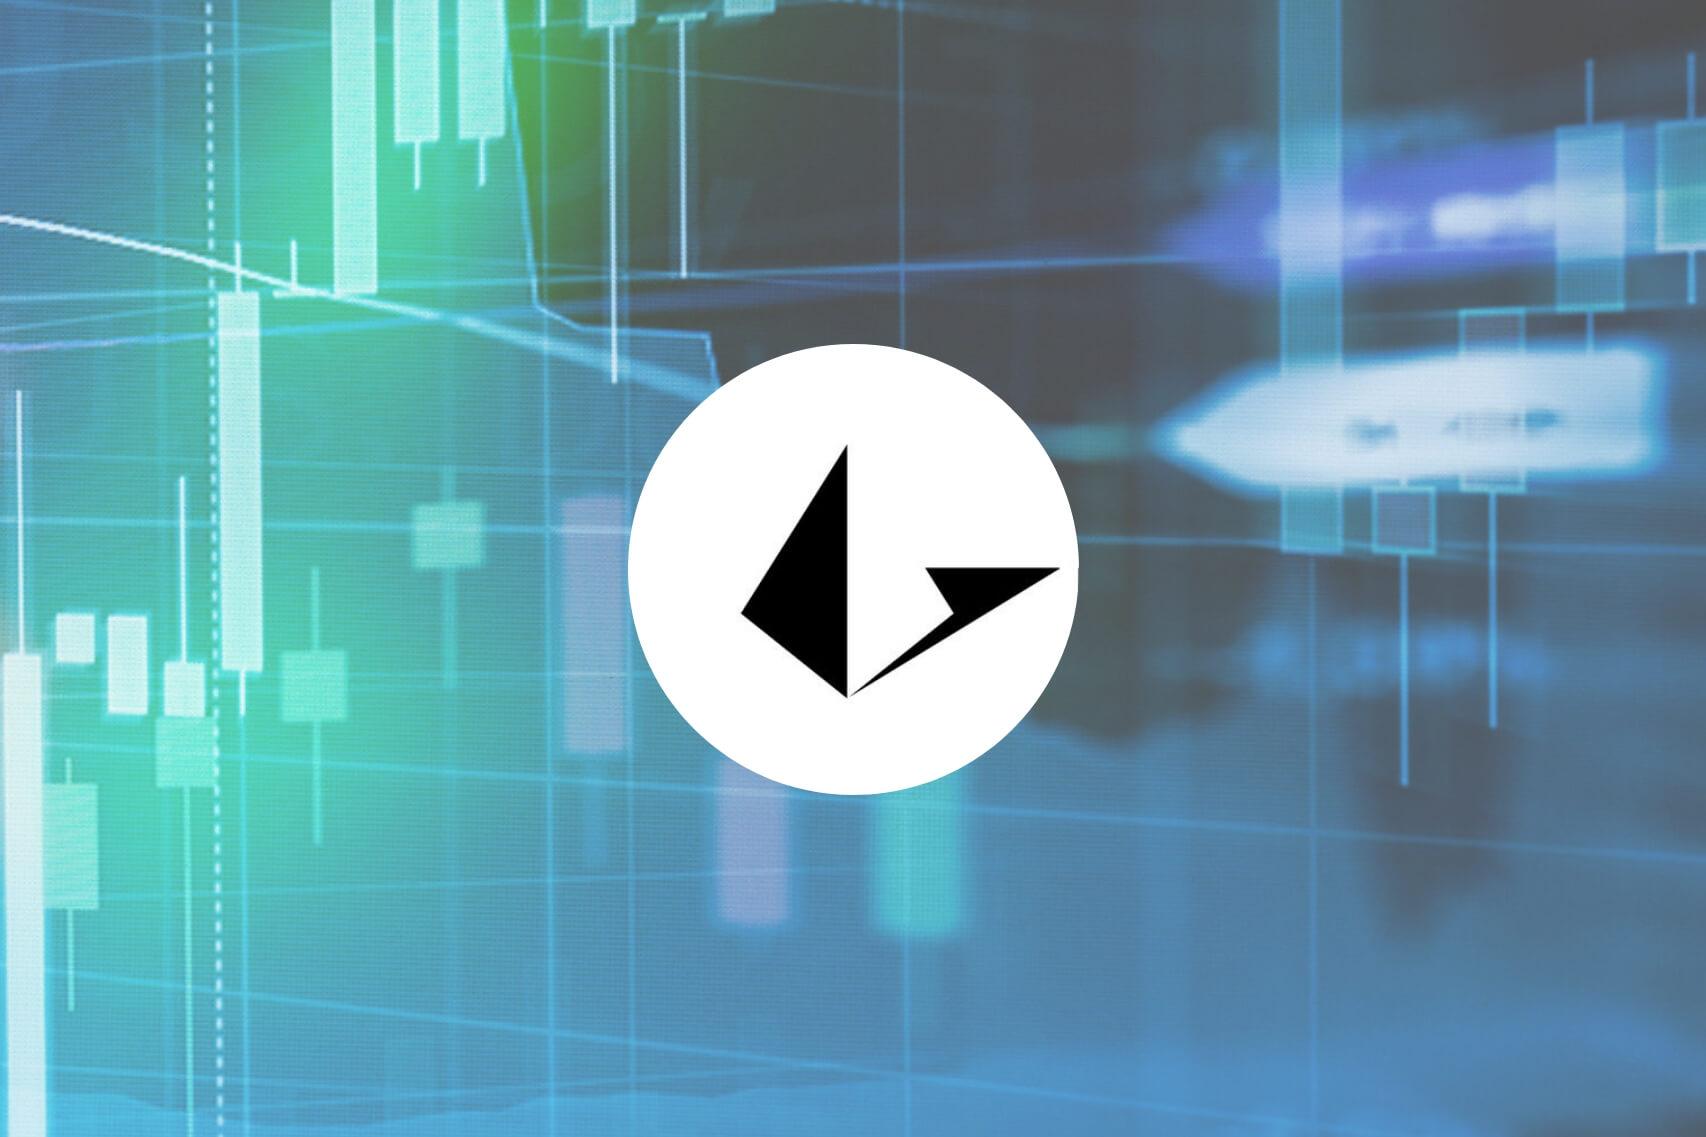 Price Analysis: Loopring